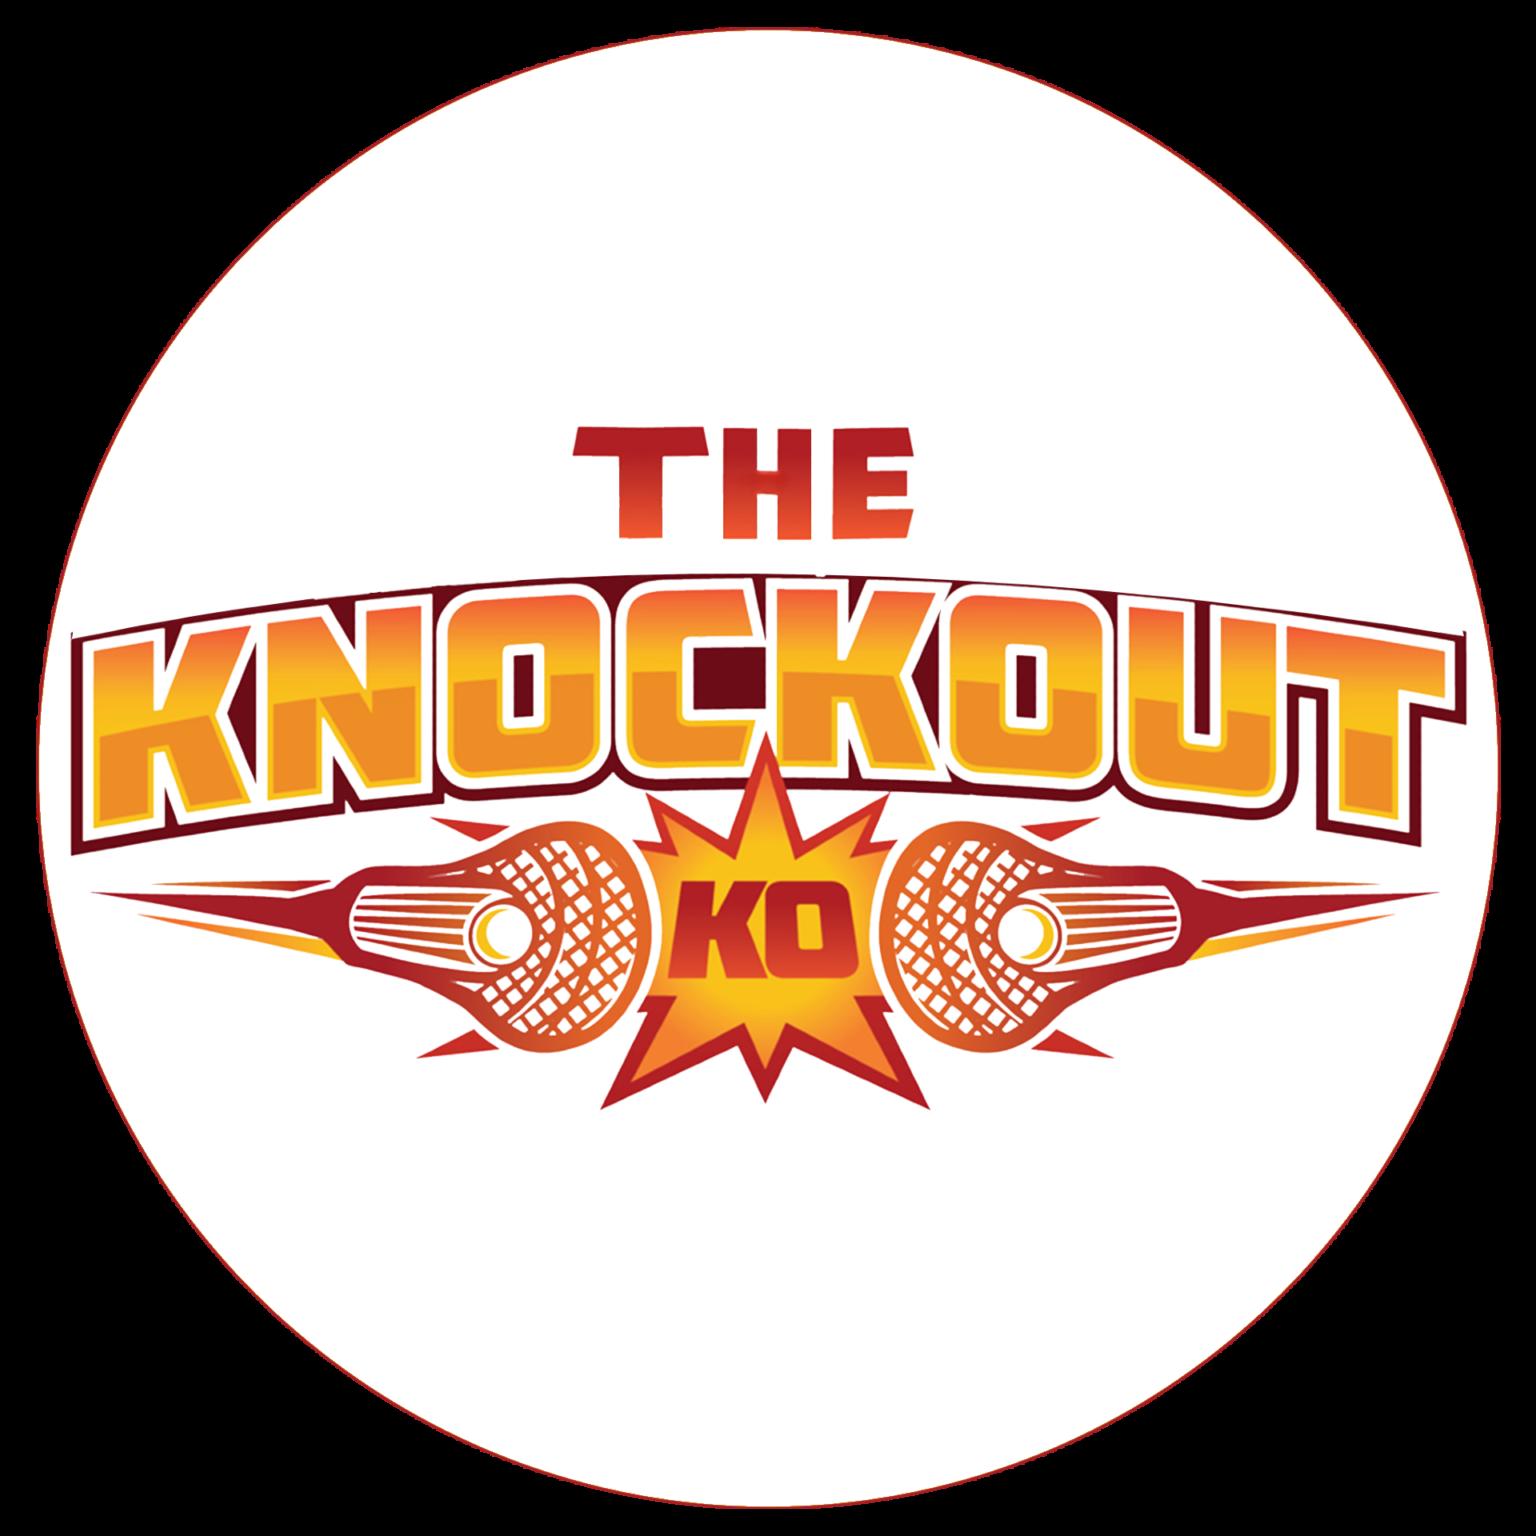 TheKnockout-1536x1536